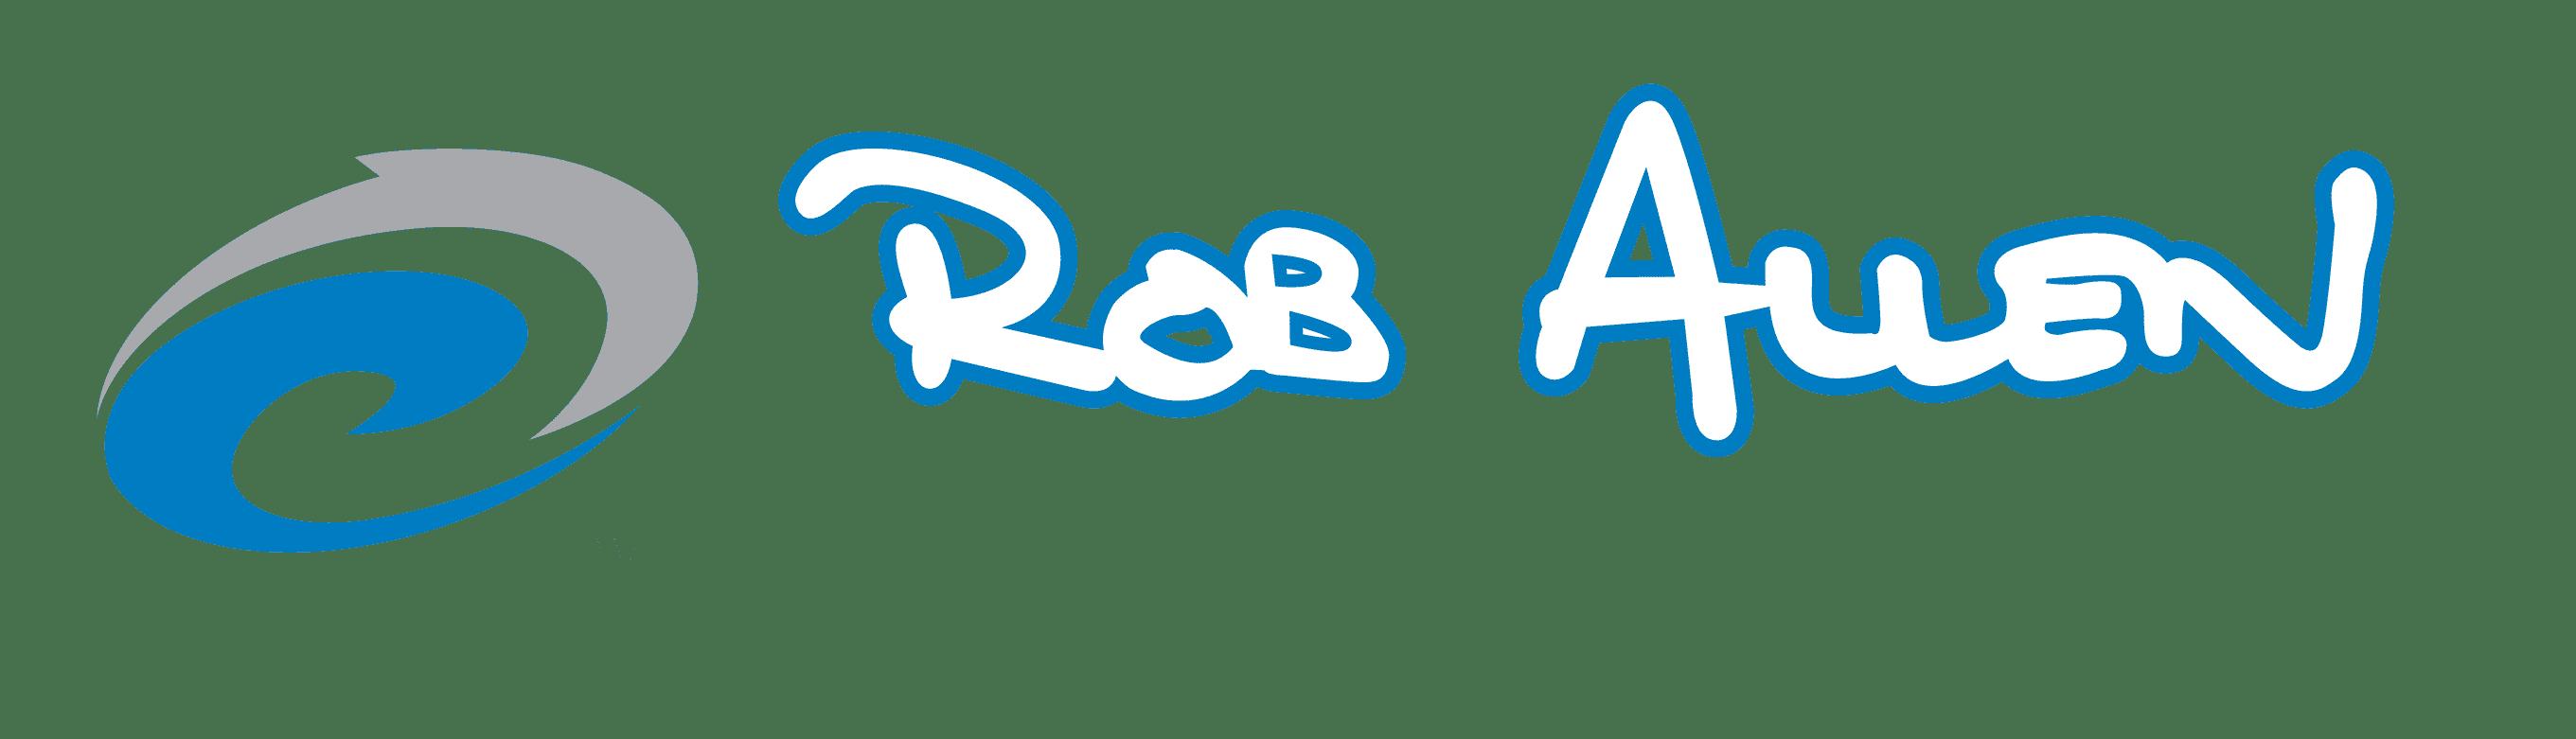 Rob Allen Spearfishing